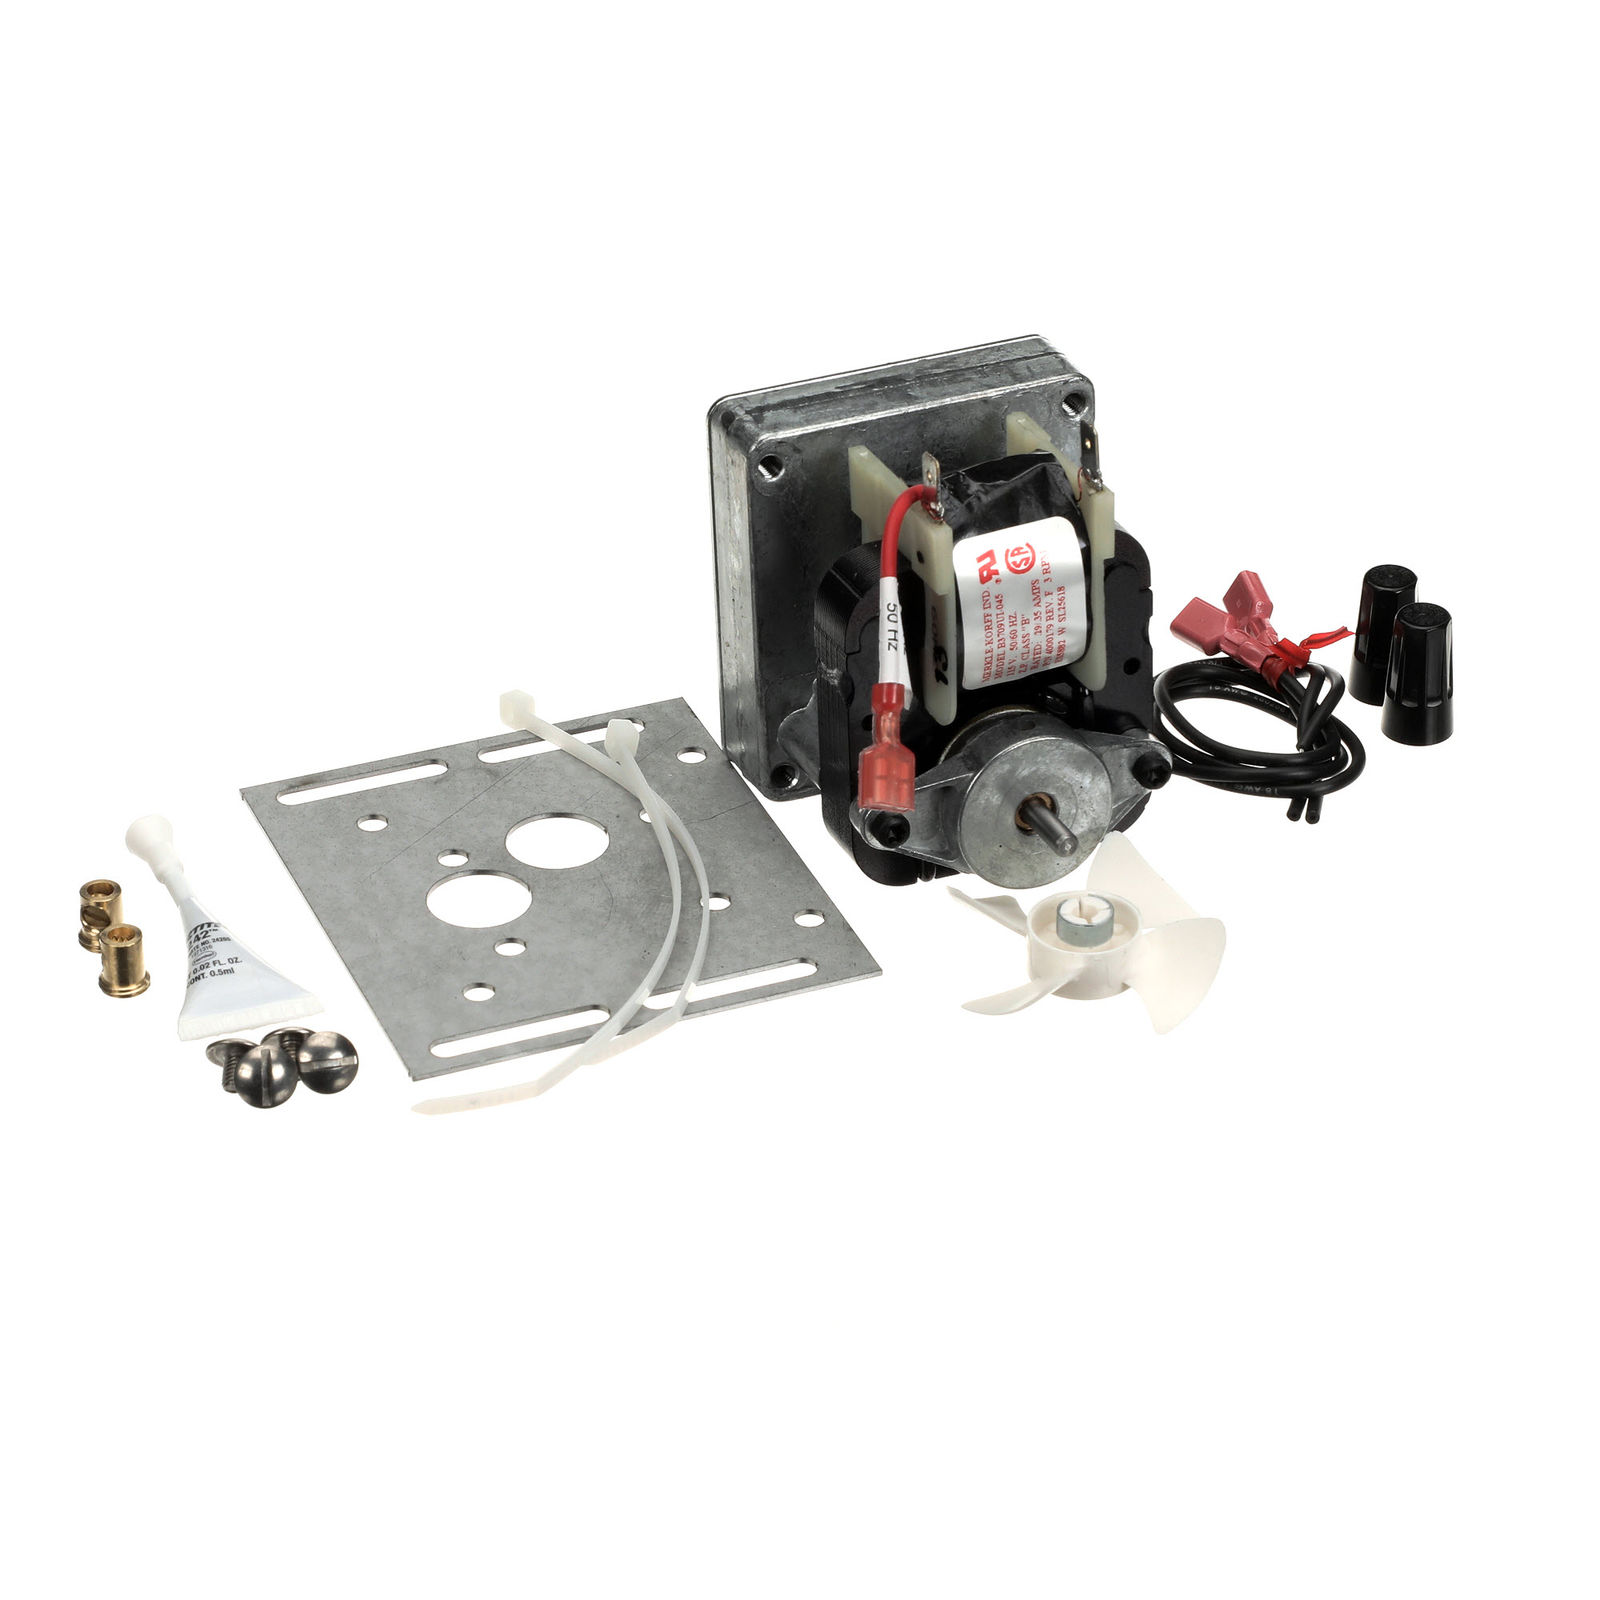 Antunes7001953Drive Motor, 115V, 3Rpm